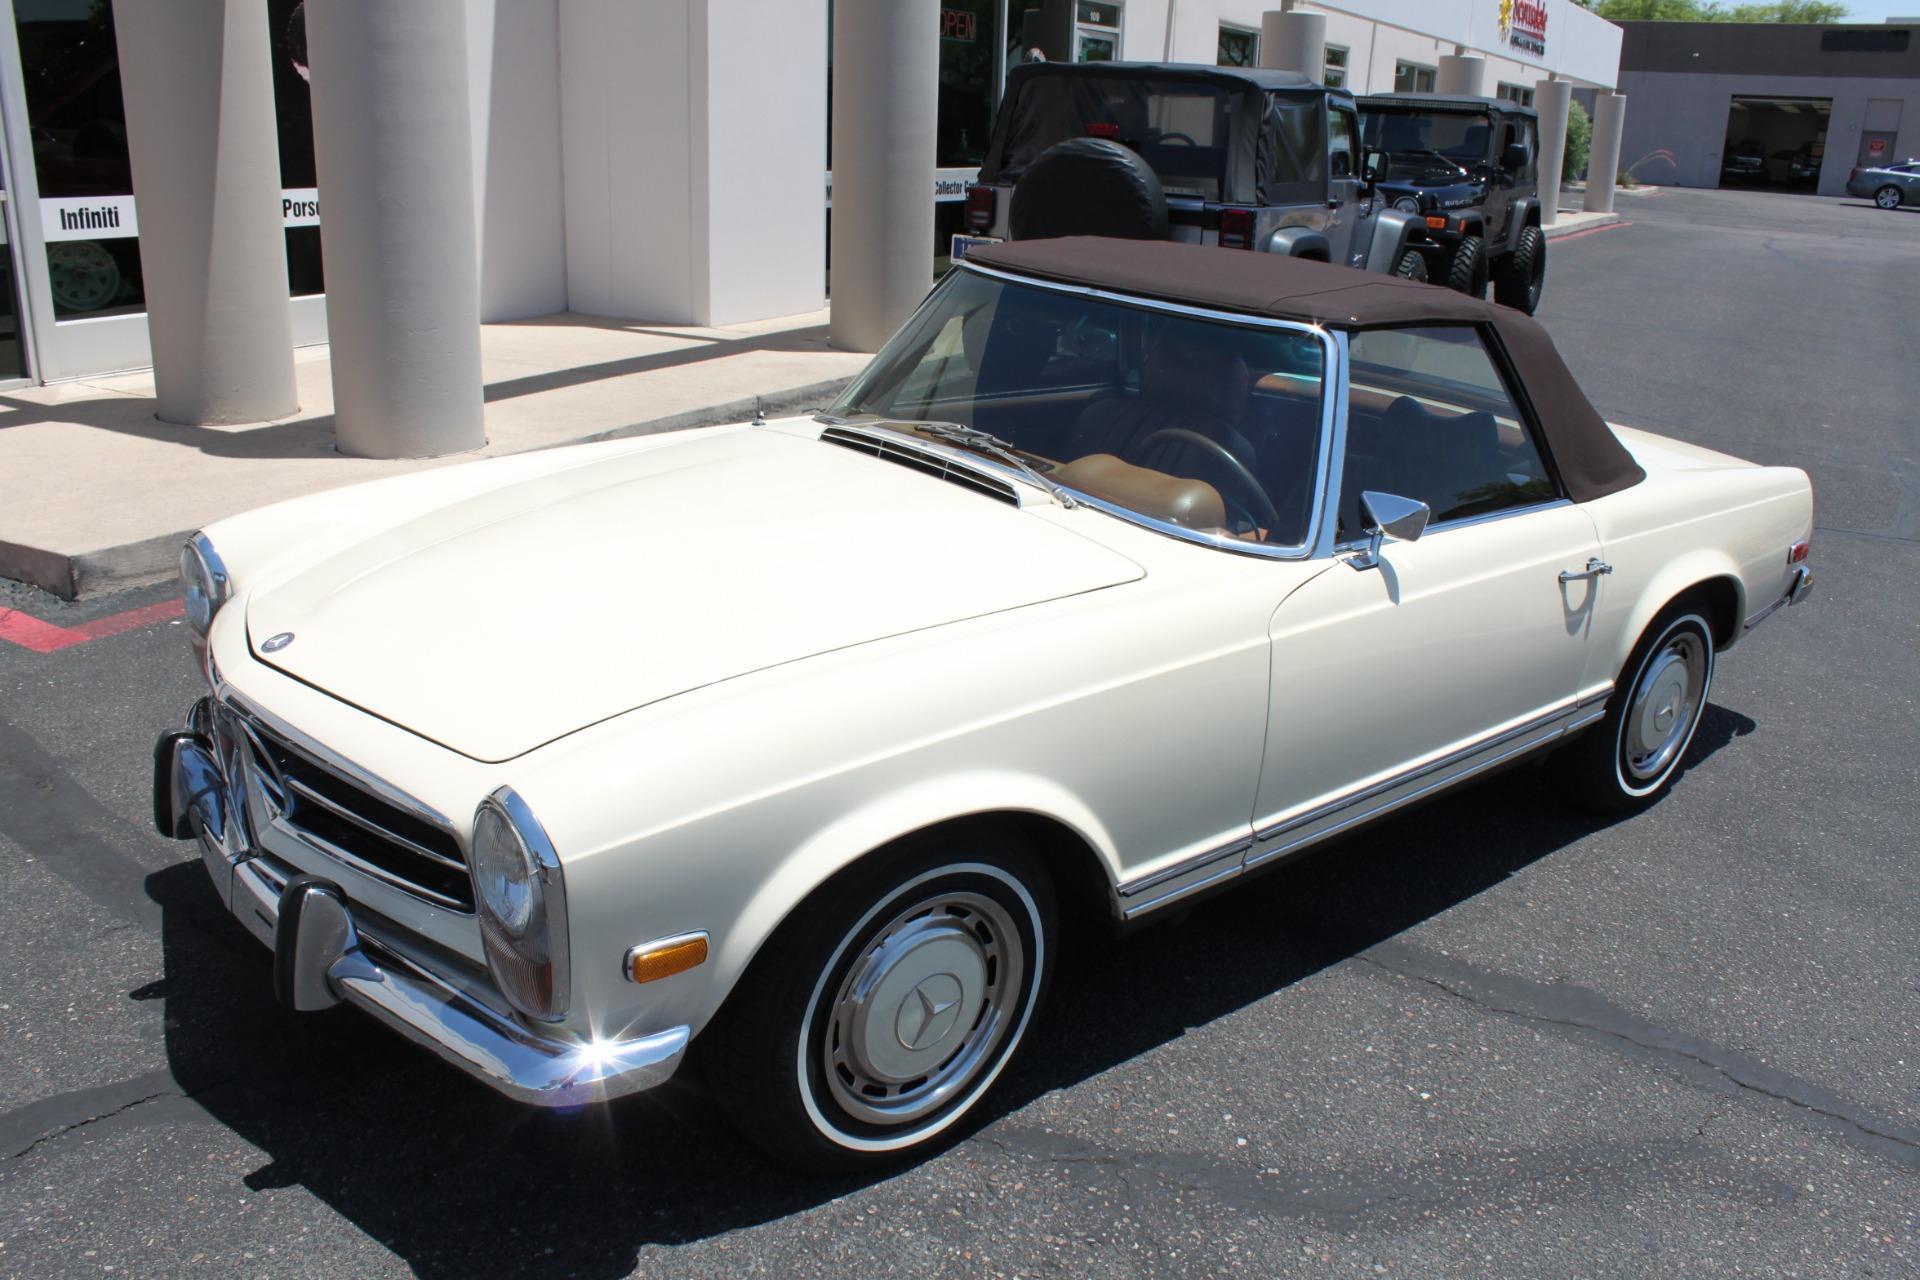 Used-1971-Mercedes-Benz-280SL-Convertible-Fiat